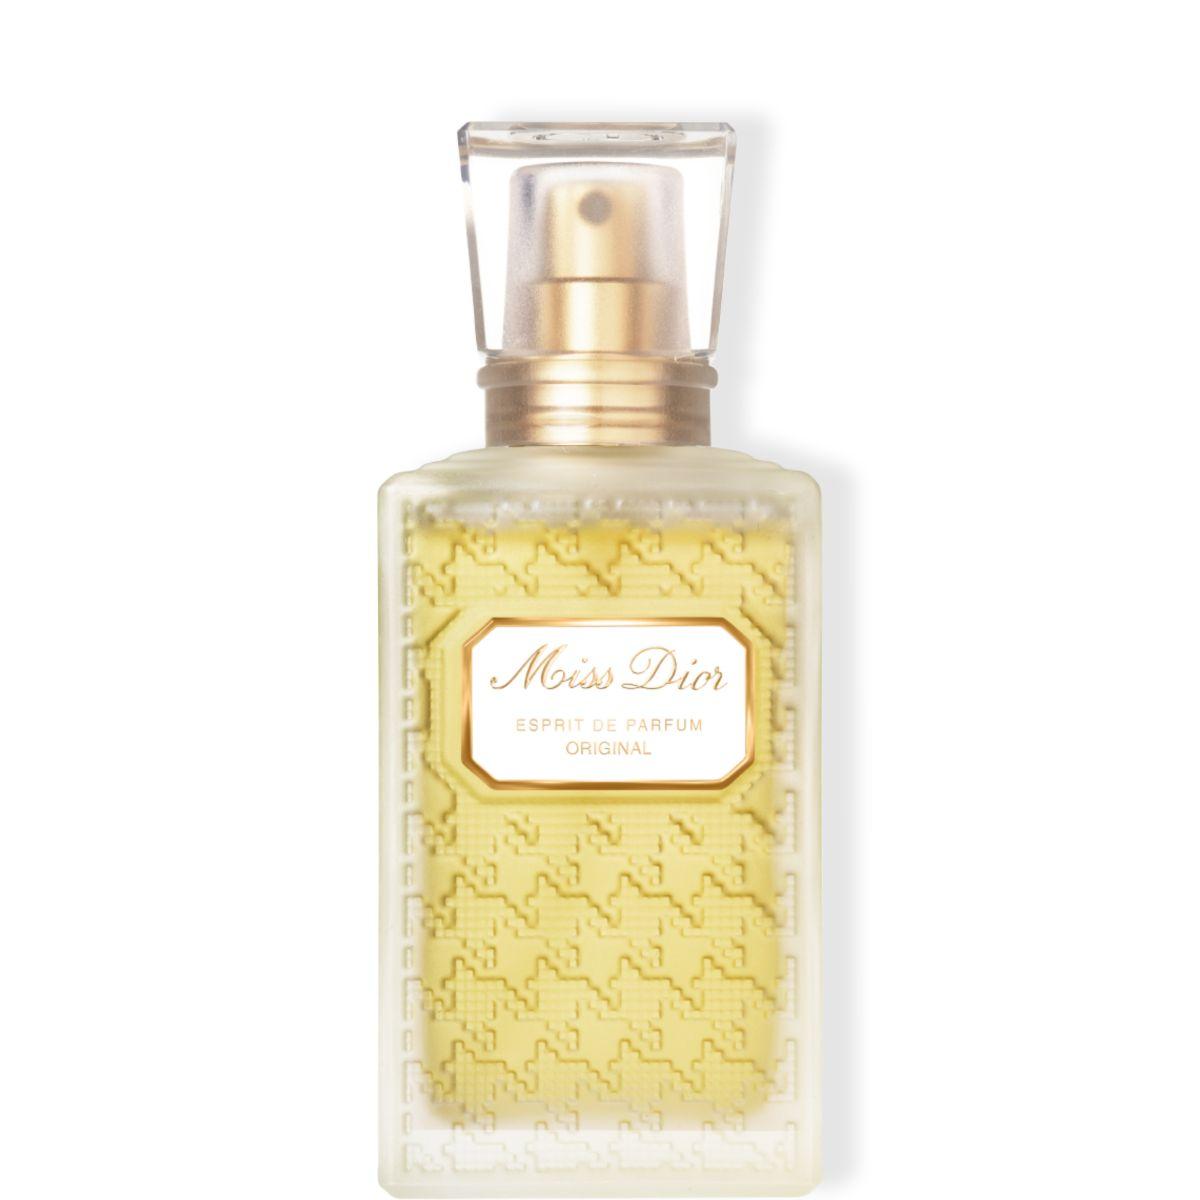 Esprit de Parfum Original Miss Dior - DIOR